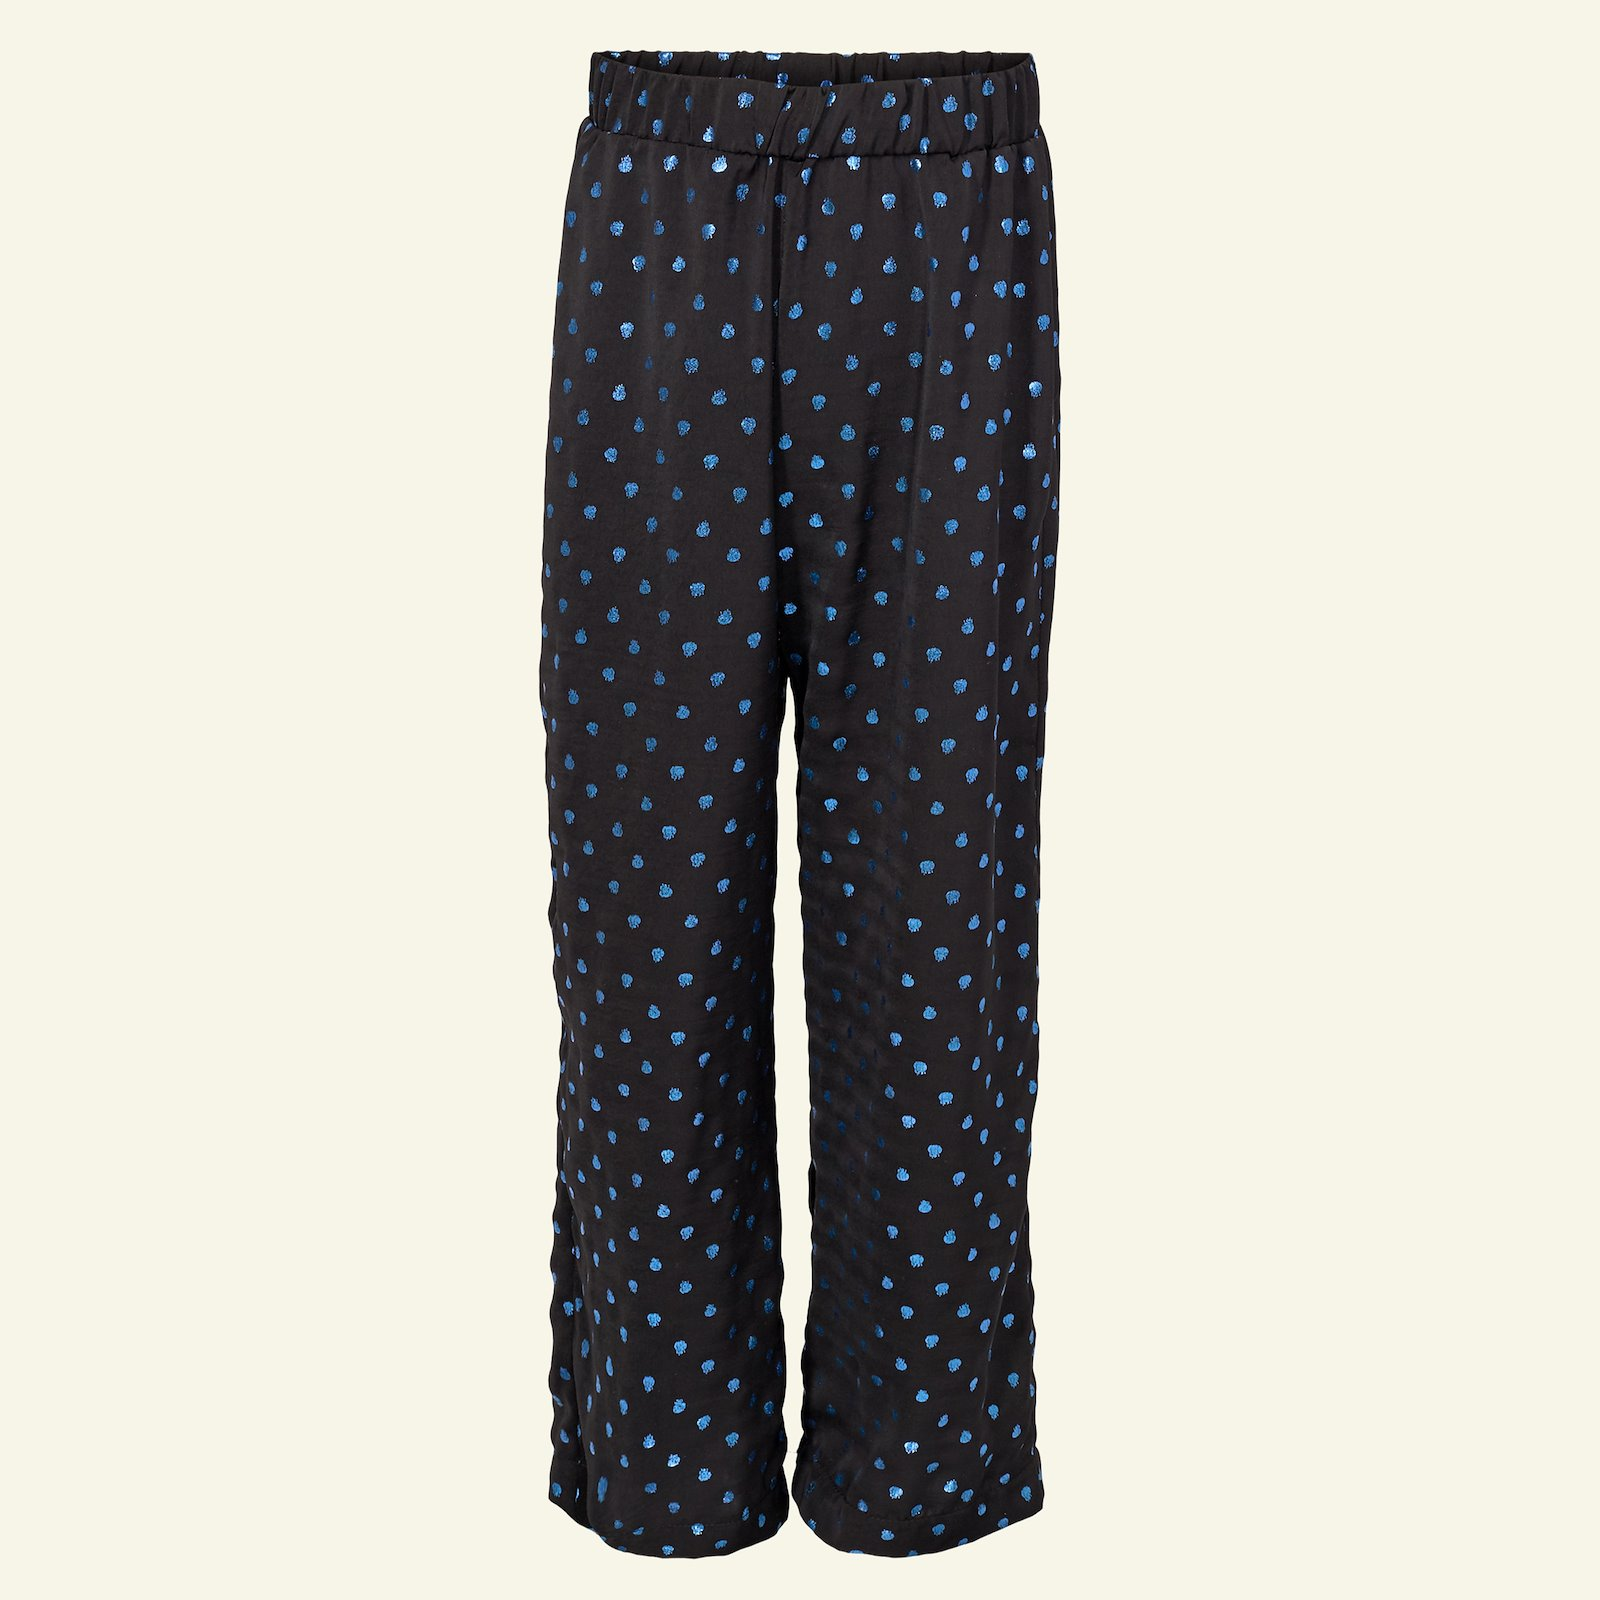 High waist and wide lege trouser, 152/12 p60034_570100_sskit